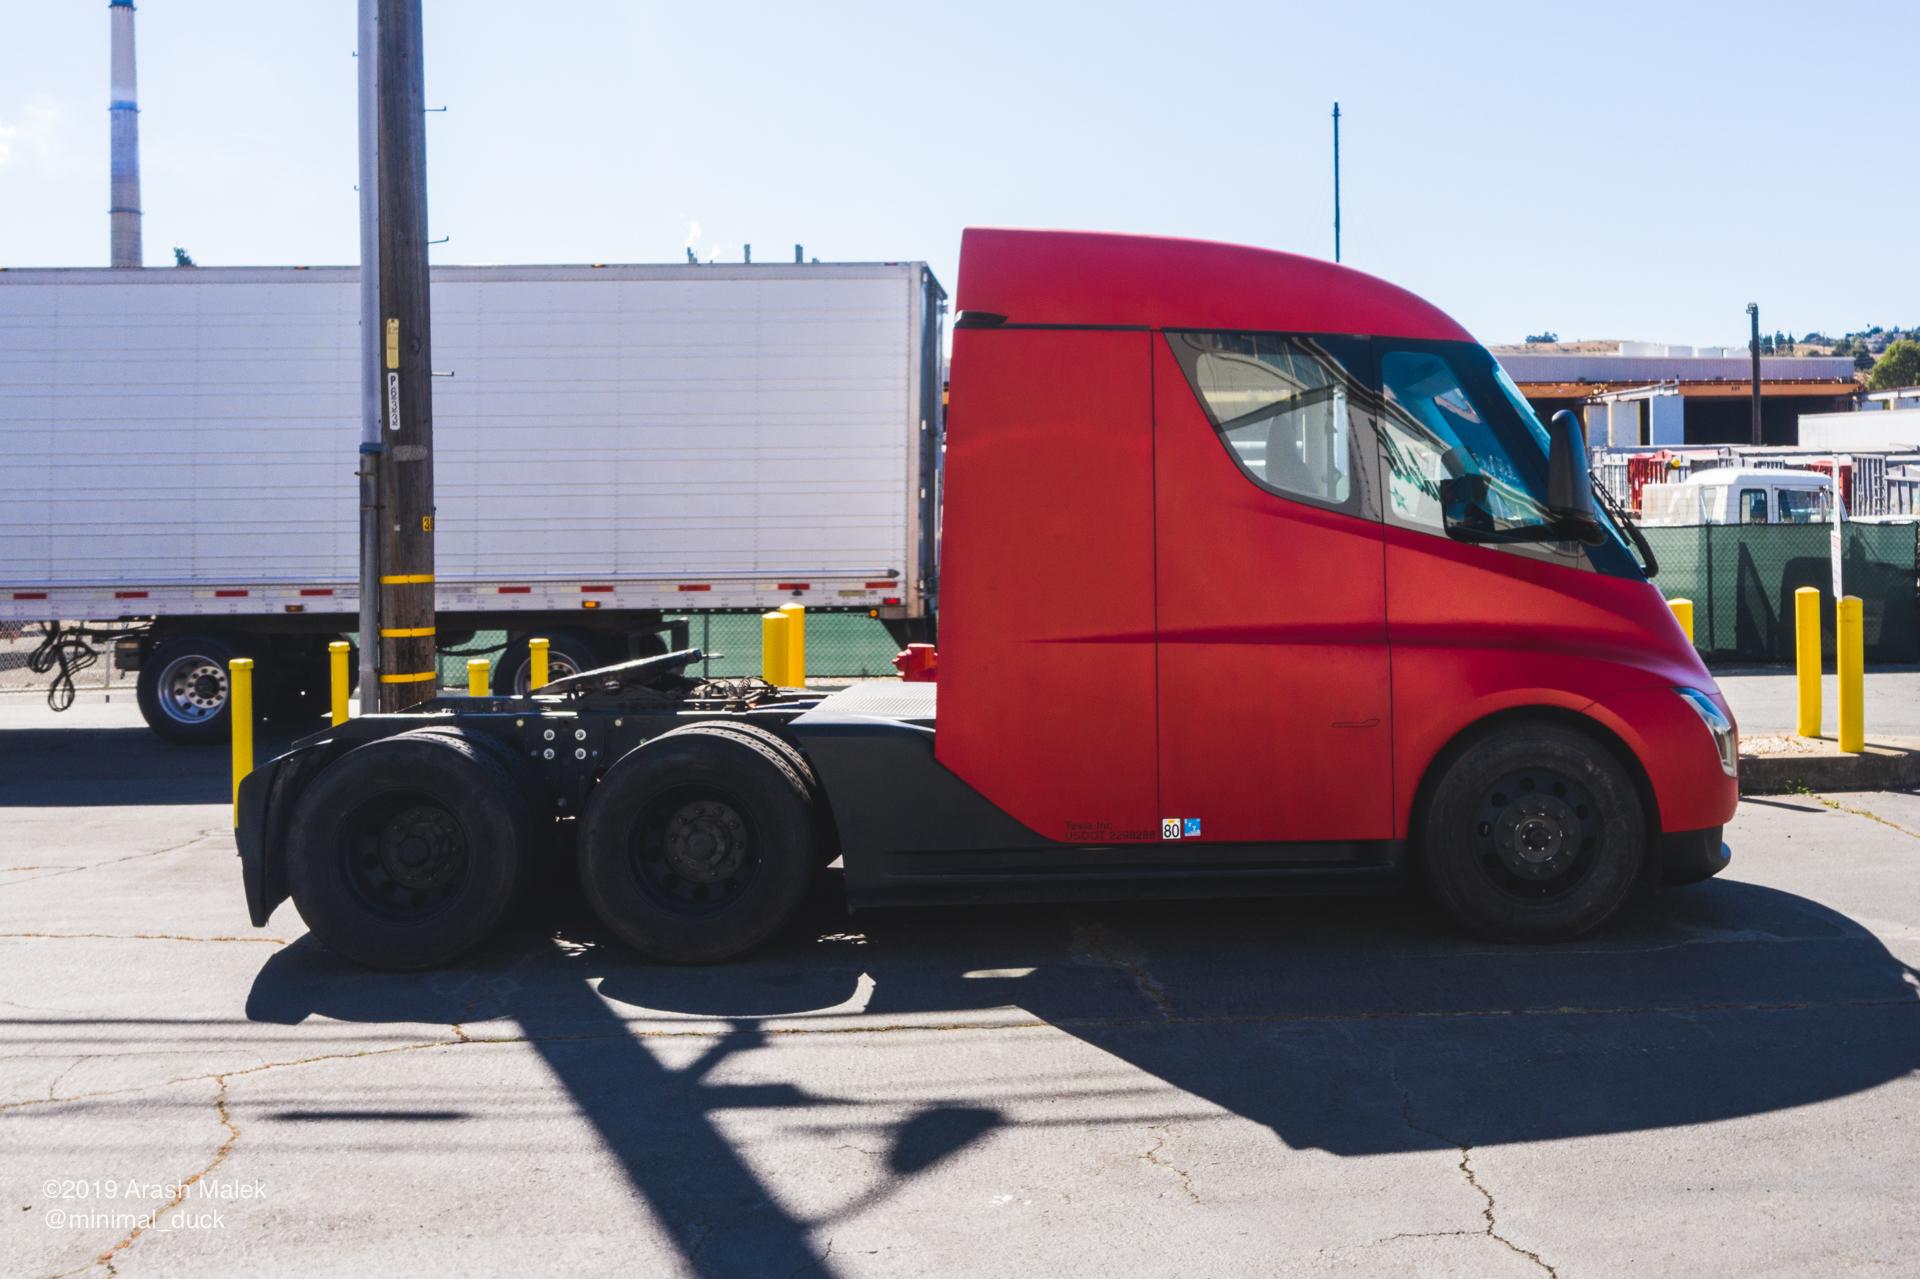 tesla-semi-yandell-truckaway-2